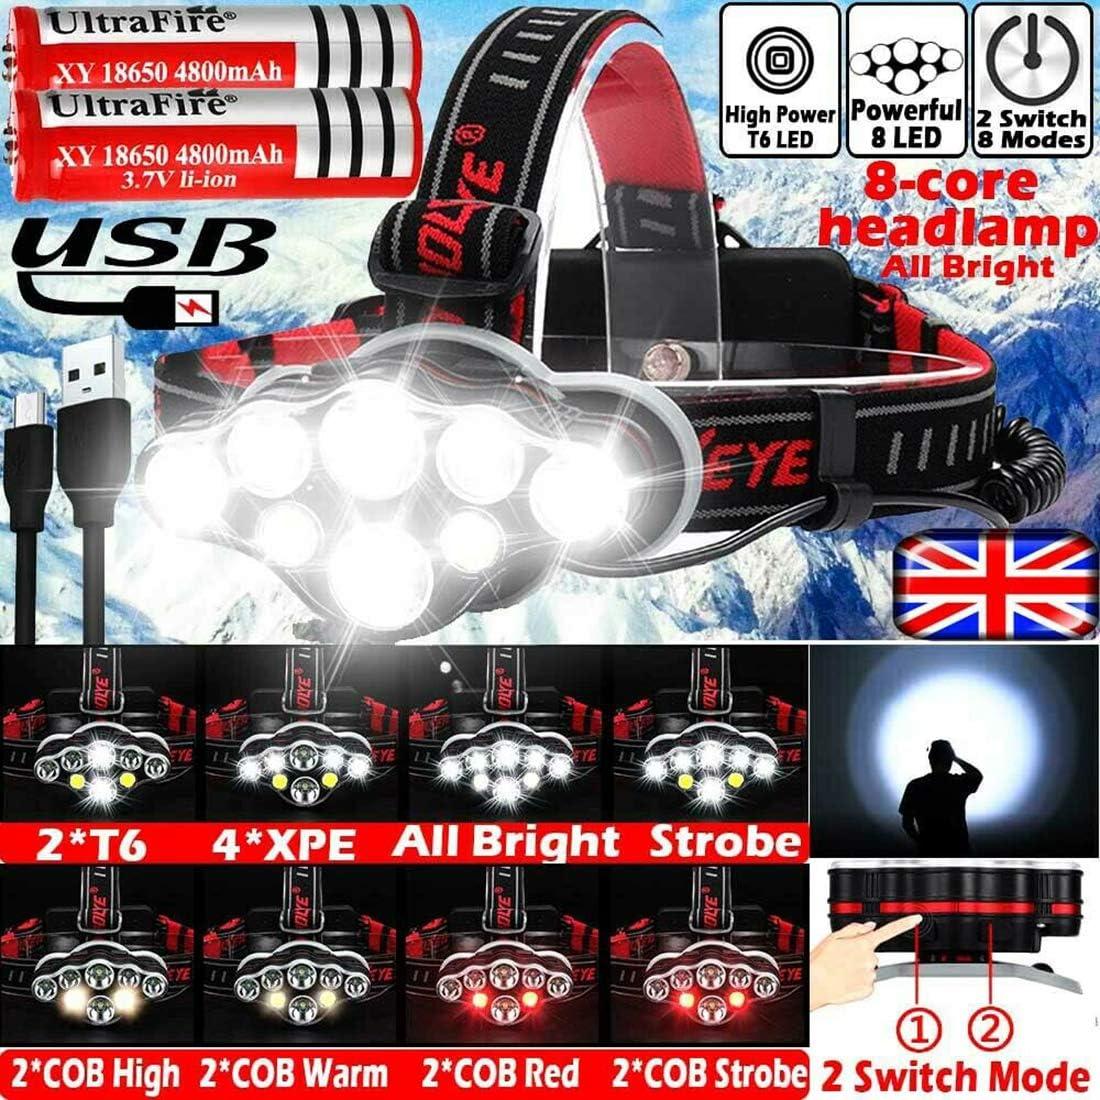 Black CloverGorge LED Camping Headlight Waterproof COB LED Headlight Ultra Bright Outdoor